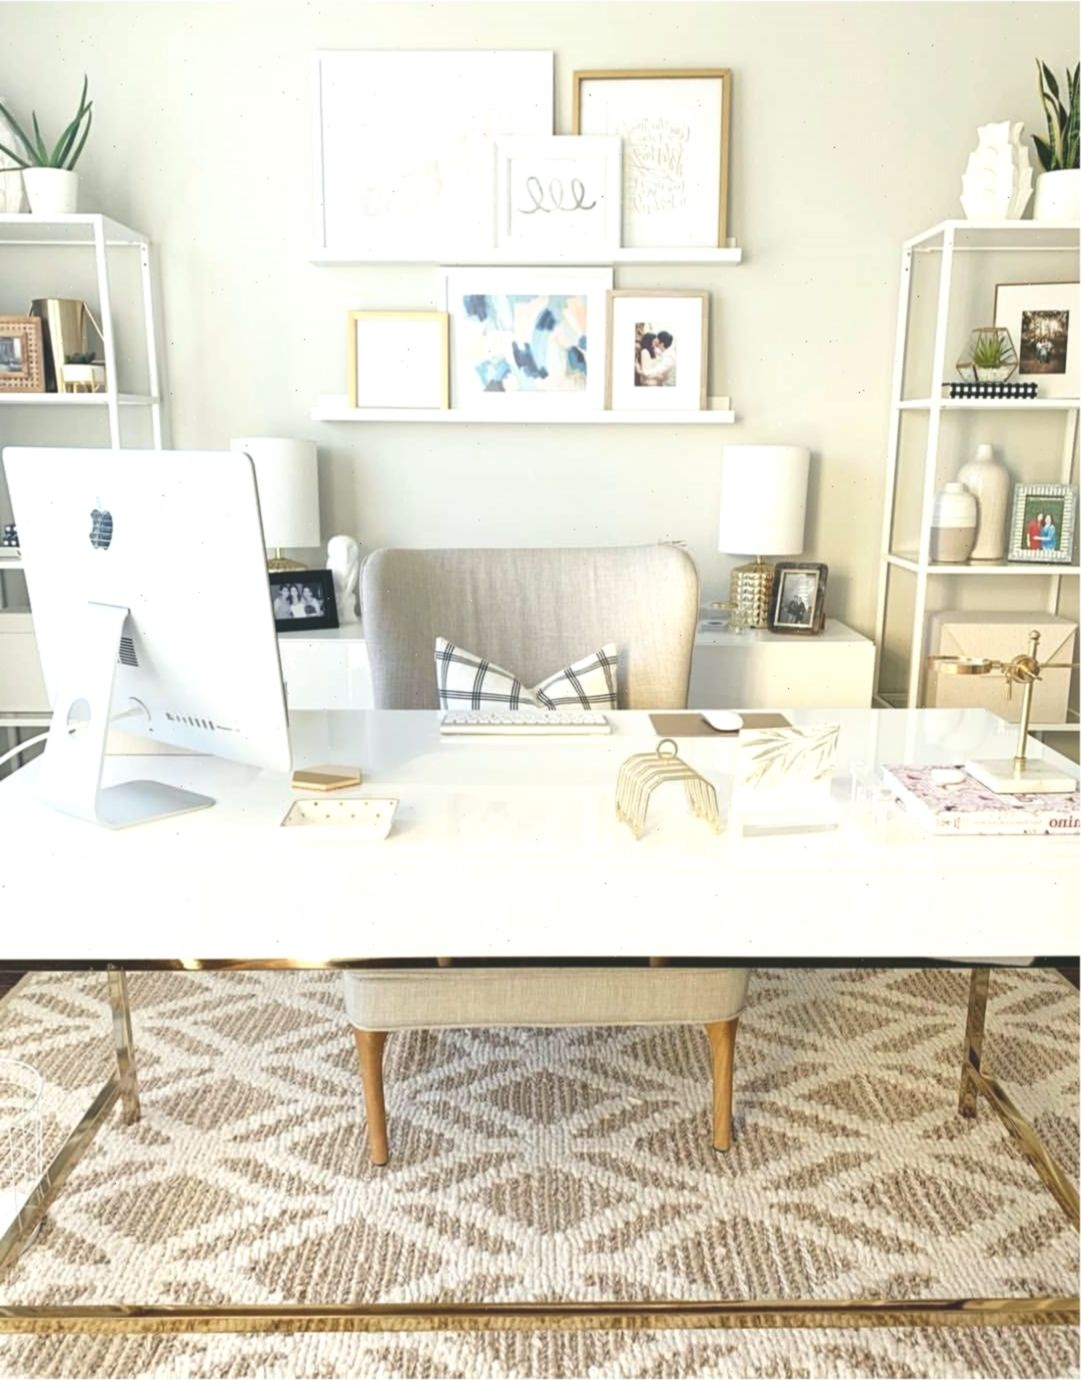 20 Home Office Ideen Modern Und Komfortabel Zuhause Homeoffice In 2020 Home Office Decor Home Office Design Home Office Space